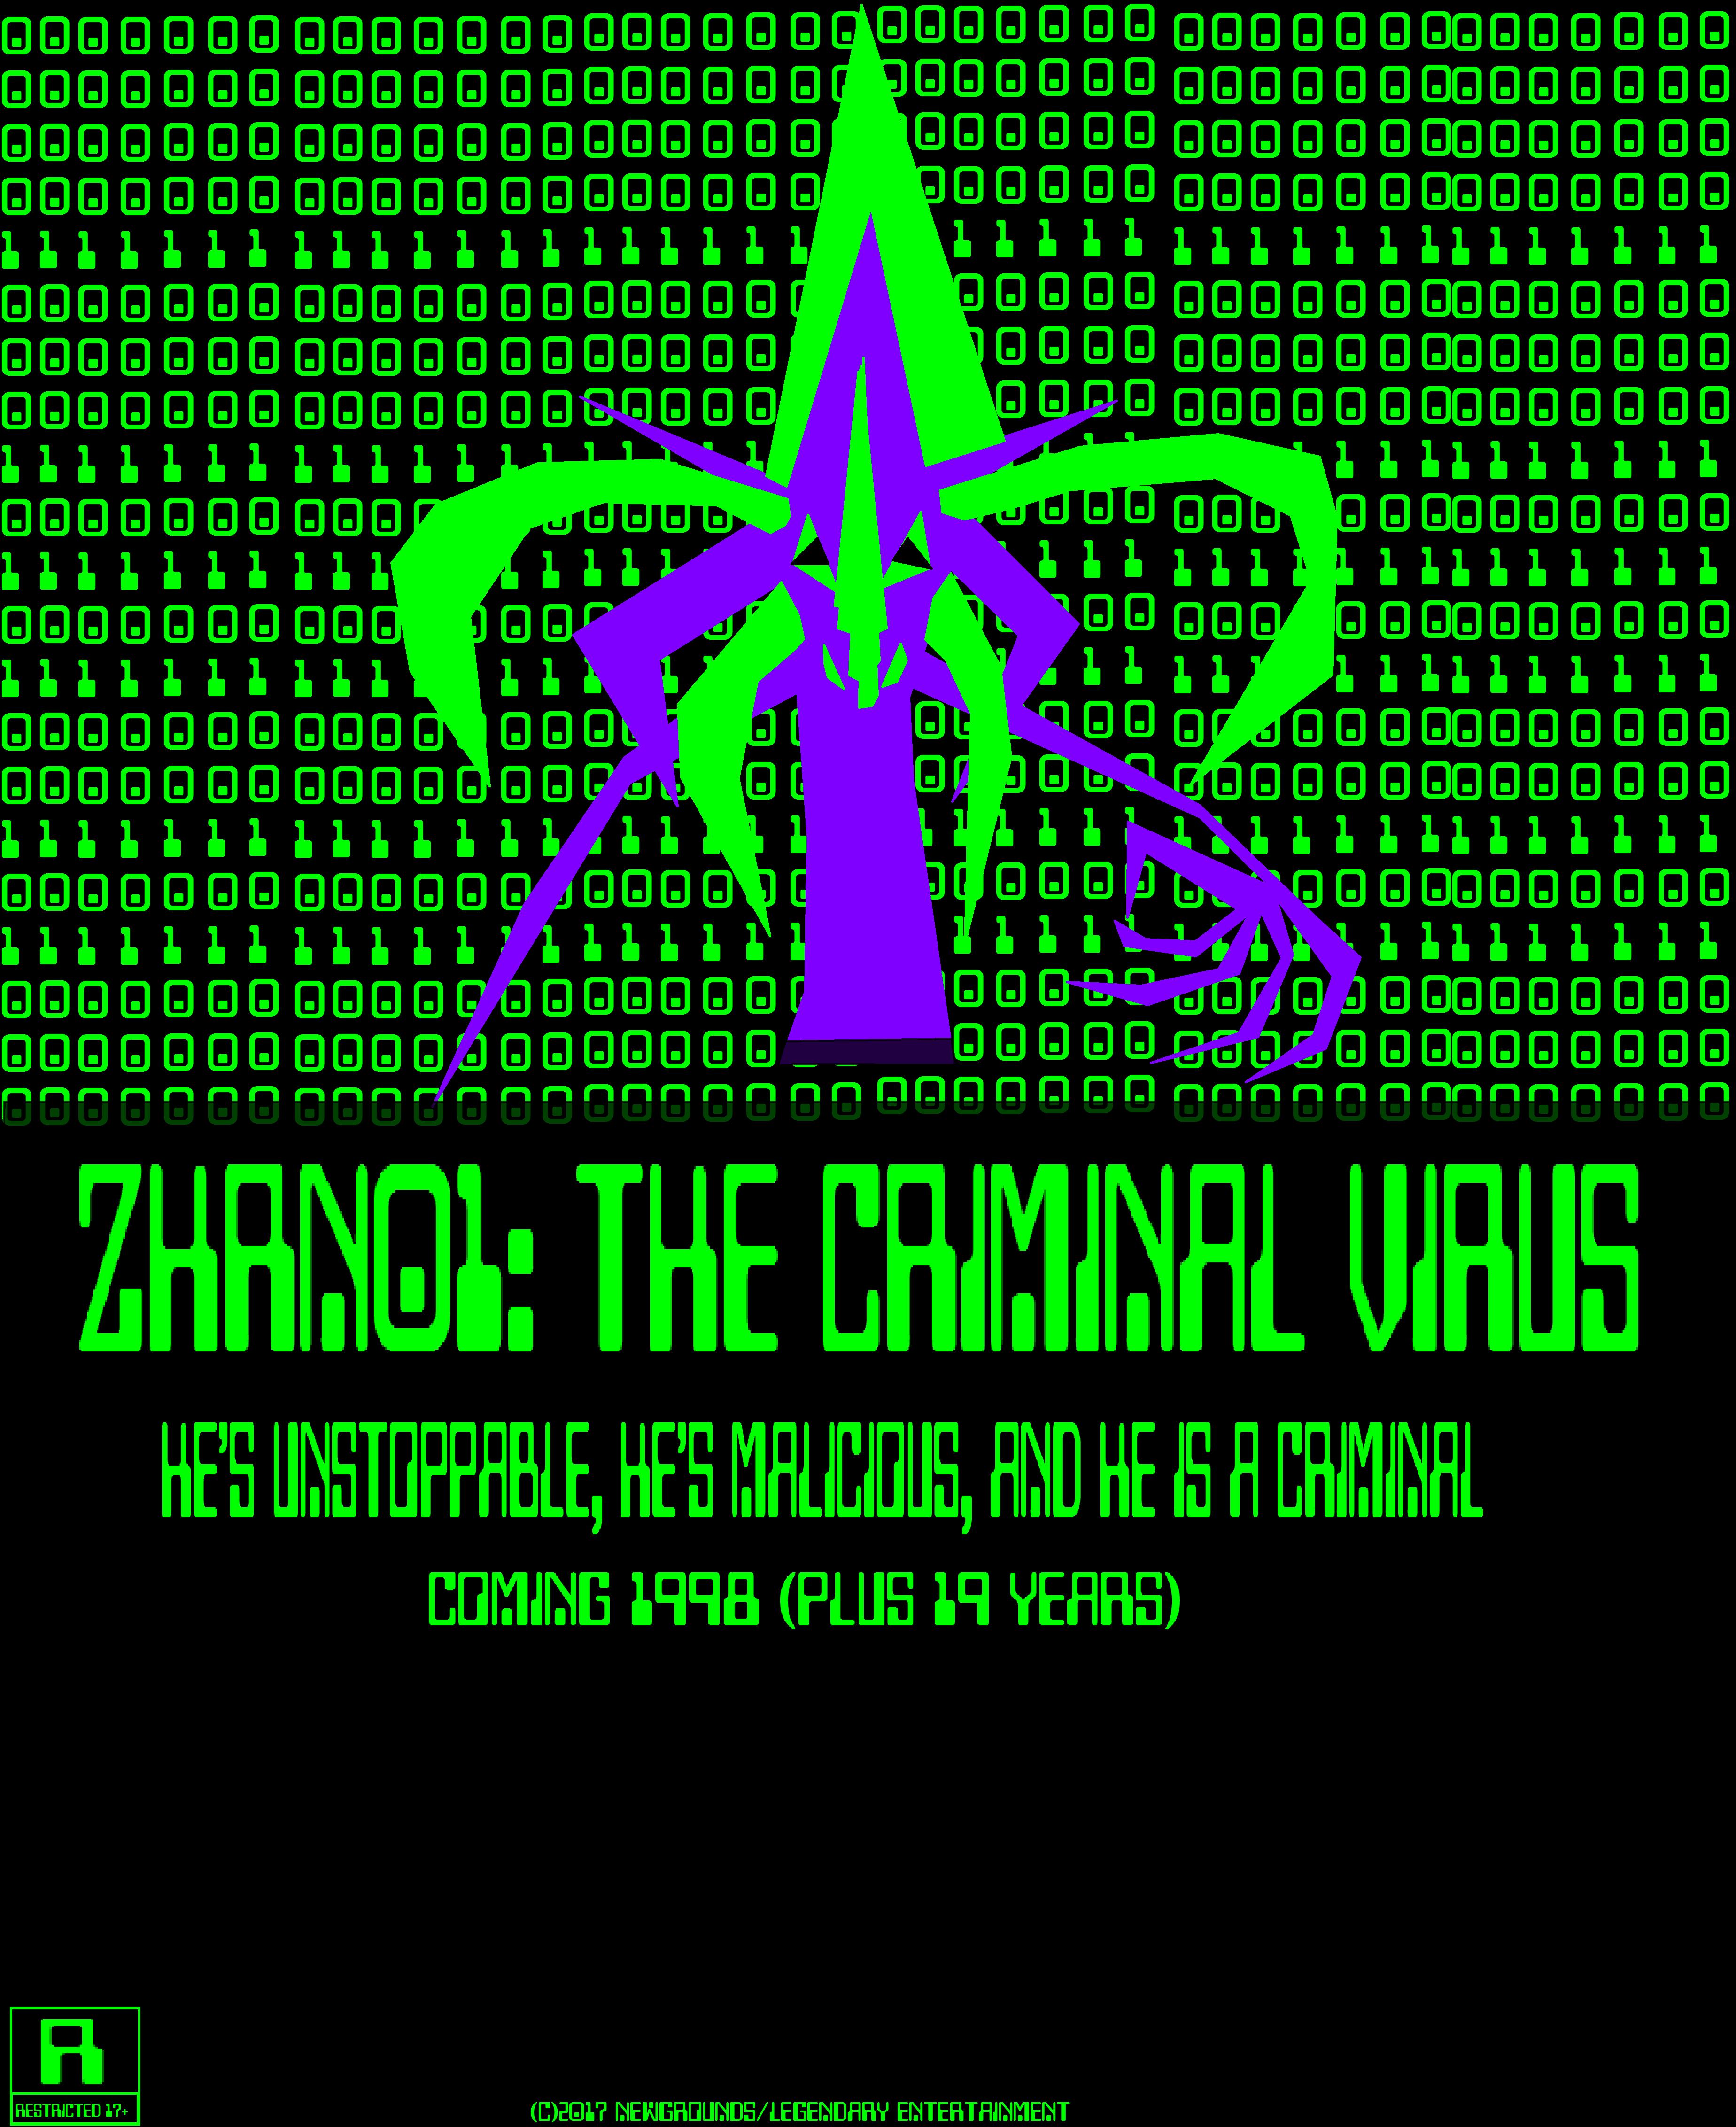 ZHRN01: The Criminal Virus (1998) Official Poster